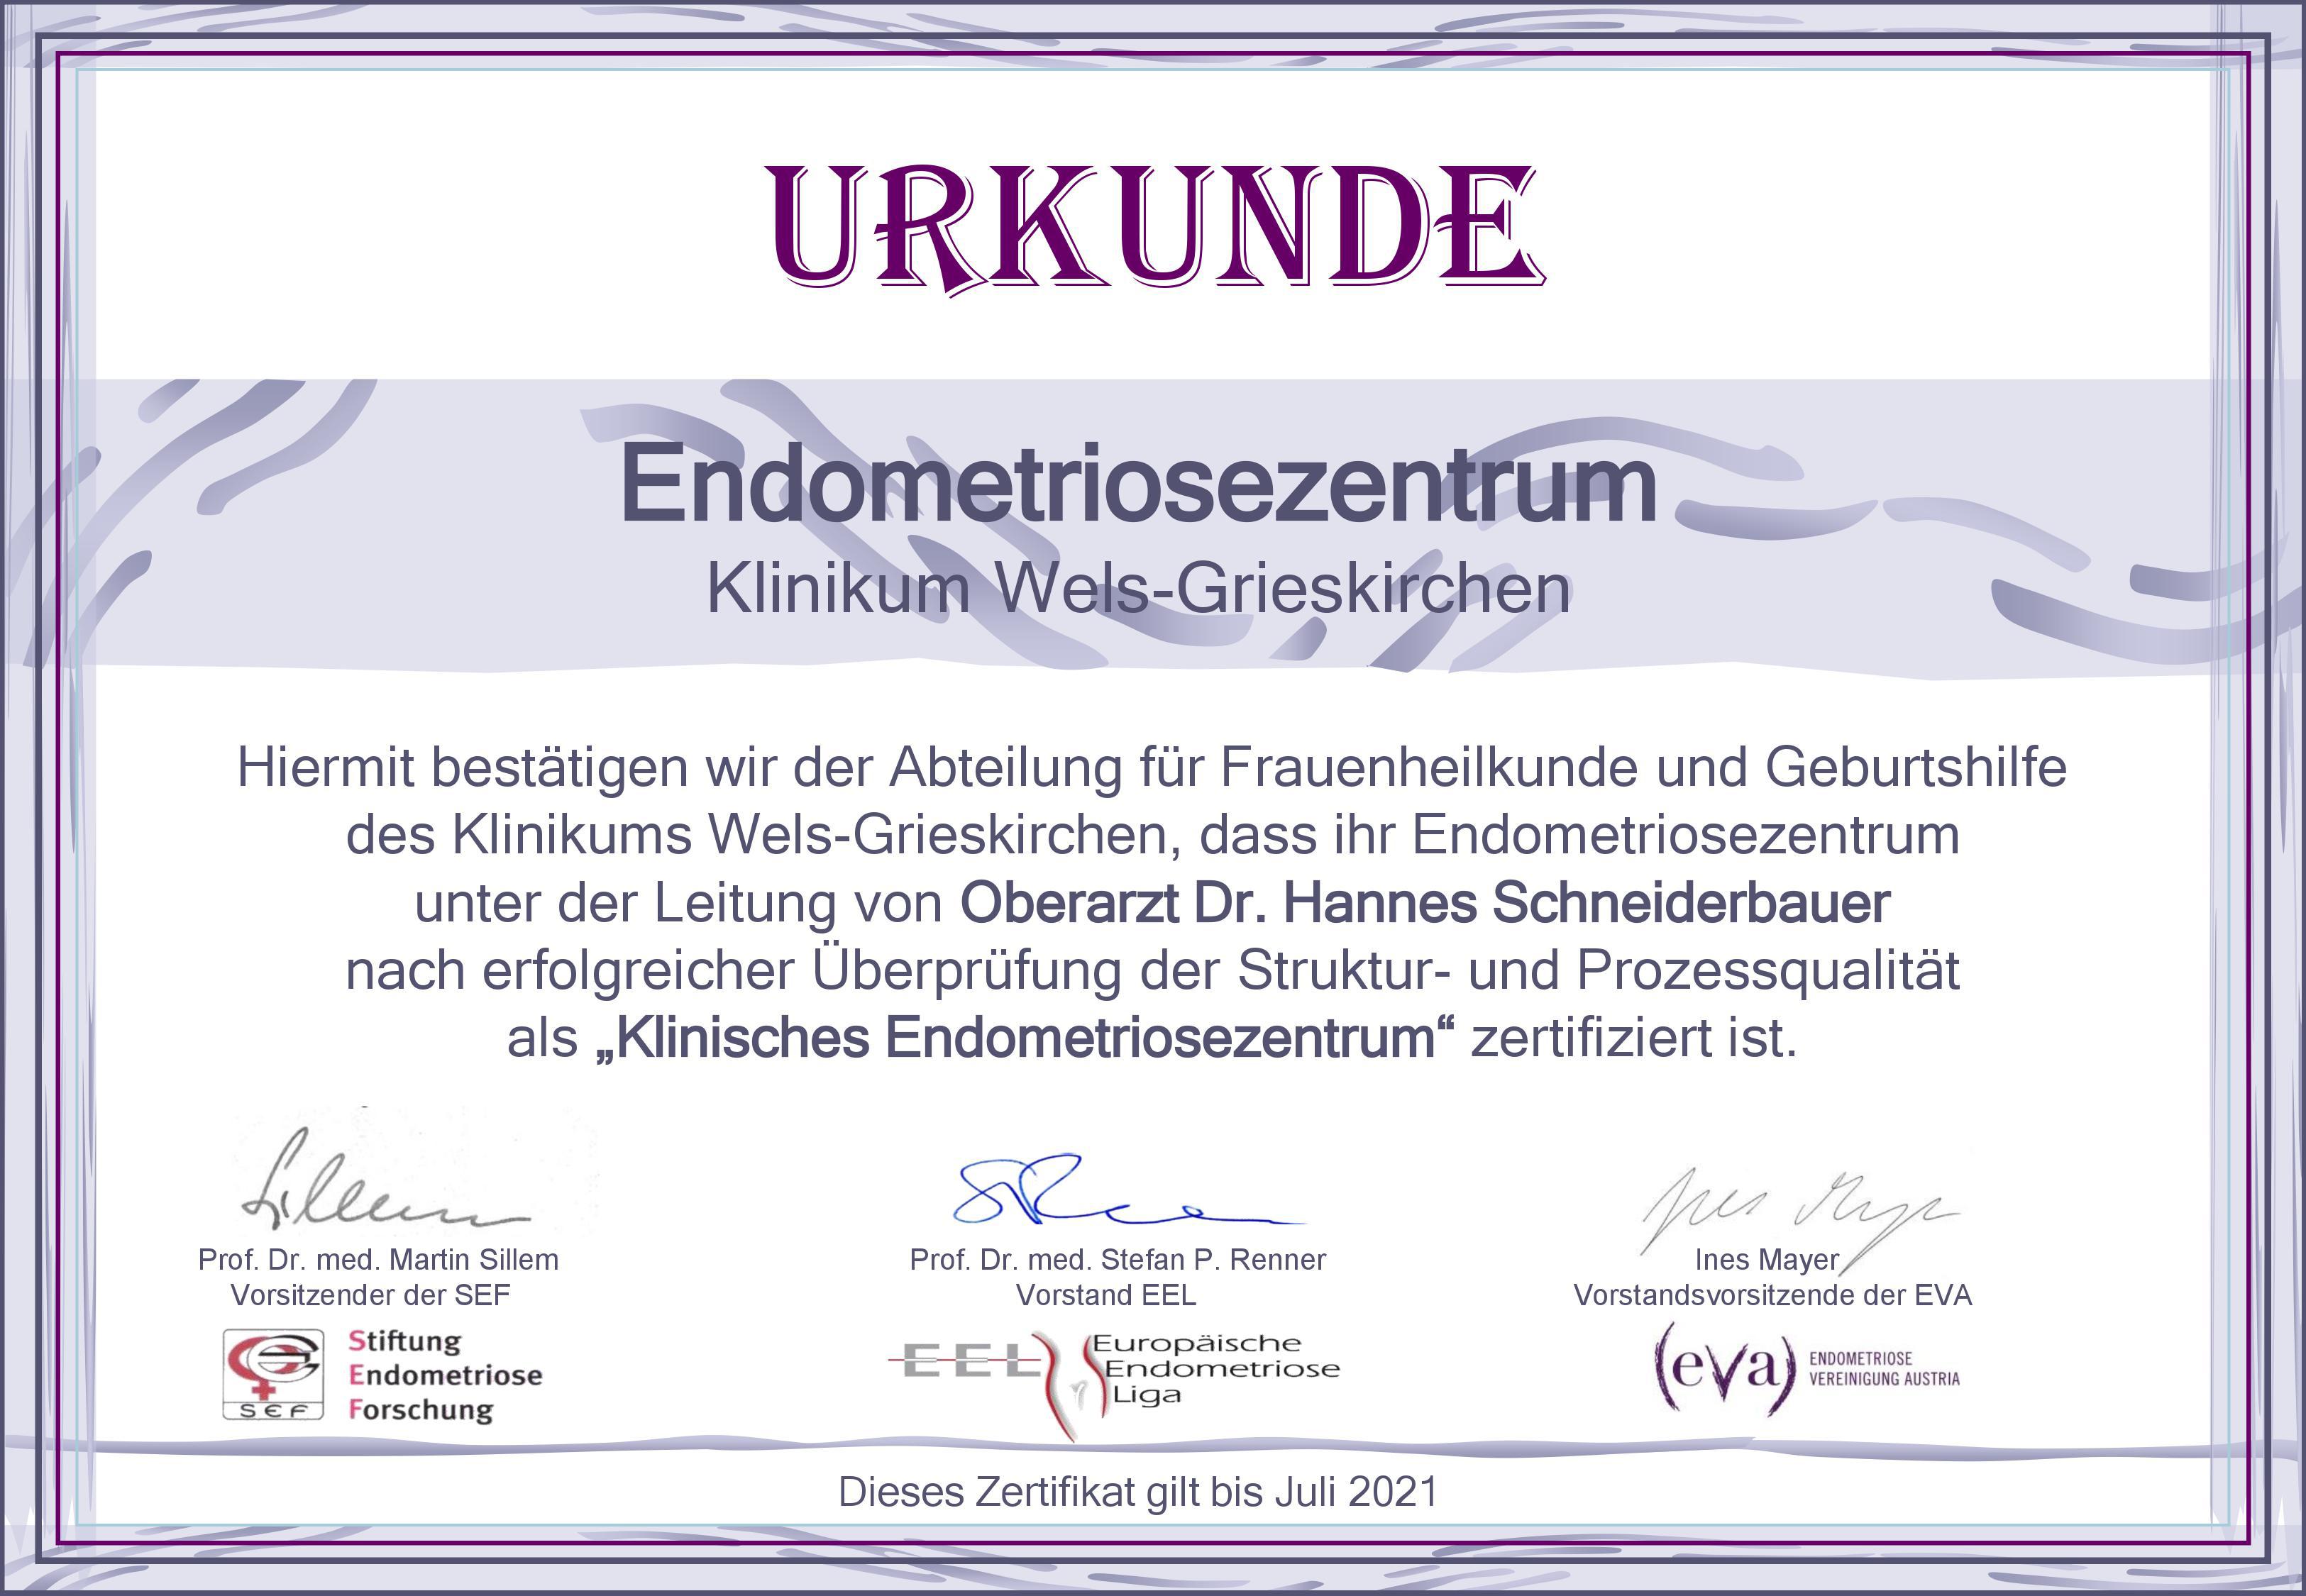 Zertifikat Endometriose-Zentrum.jpg